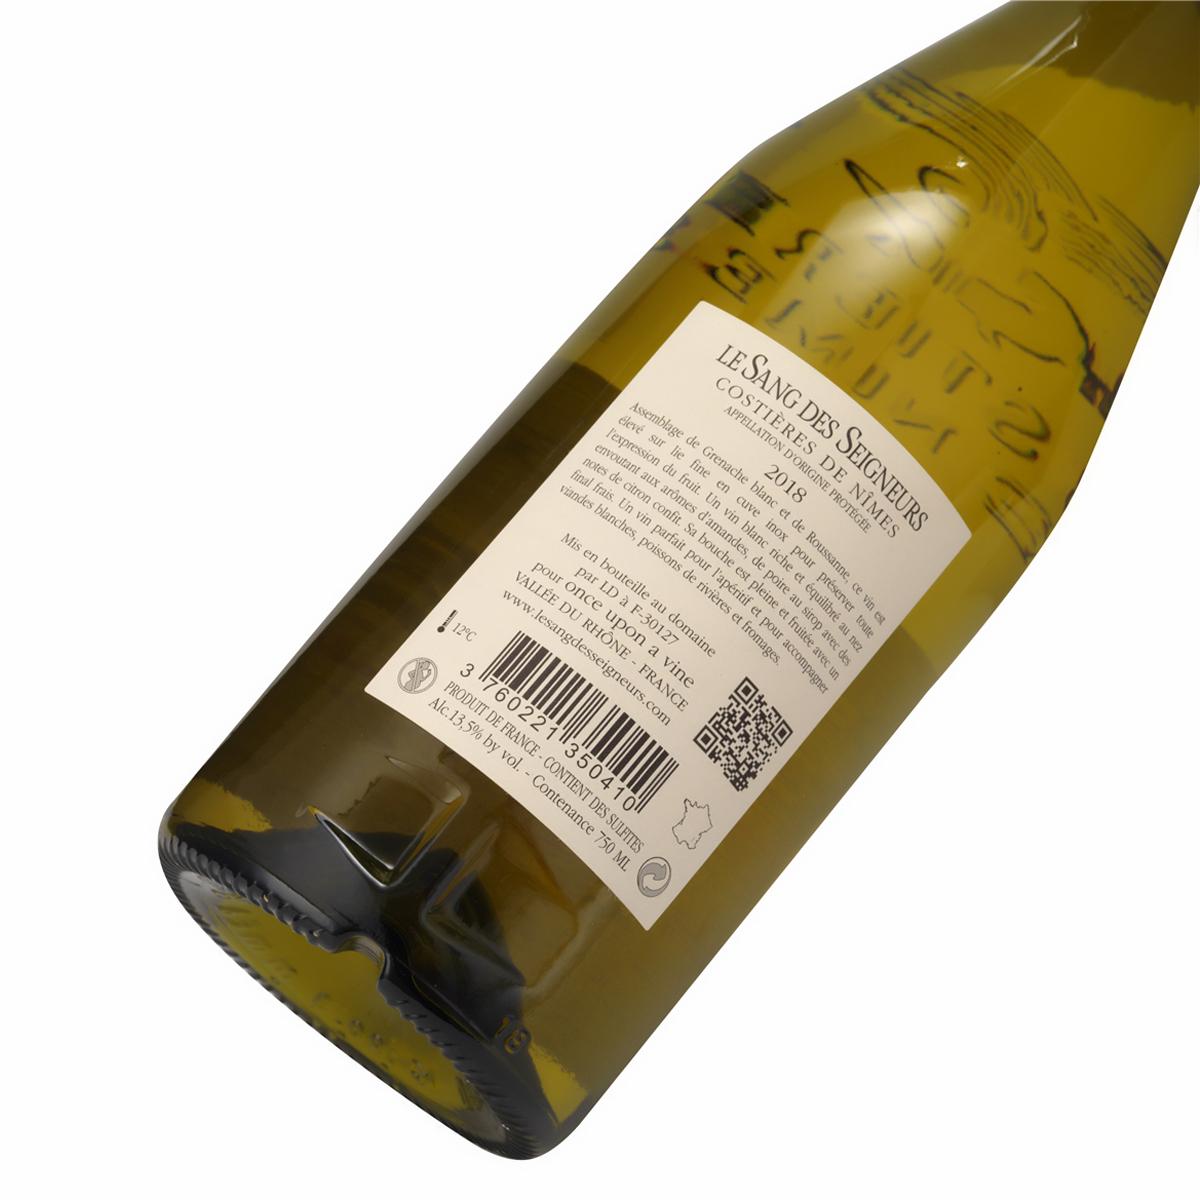 法国尼姆干白葡萄酒  Le Sang des Seigneurs